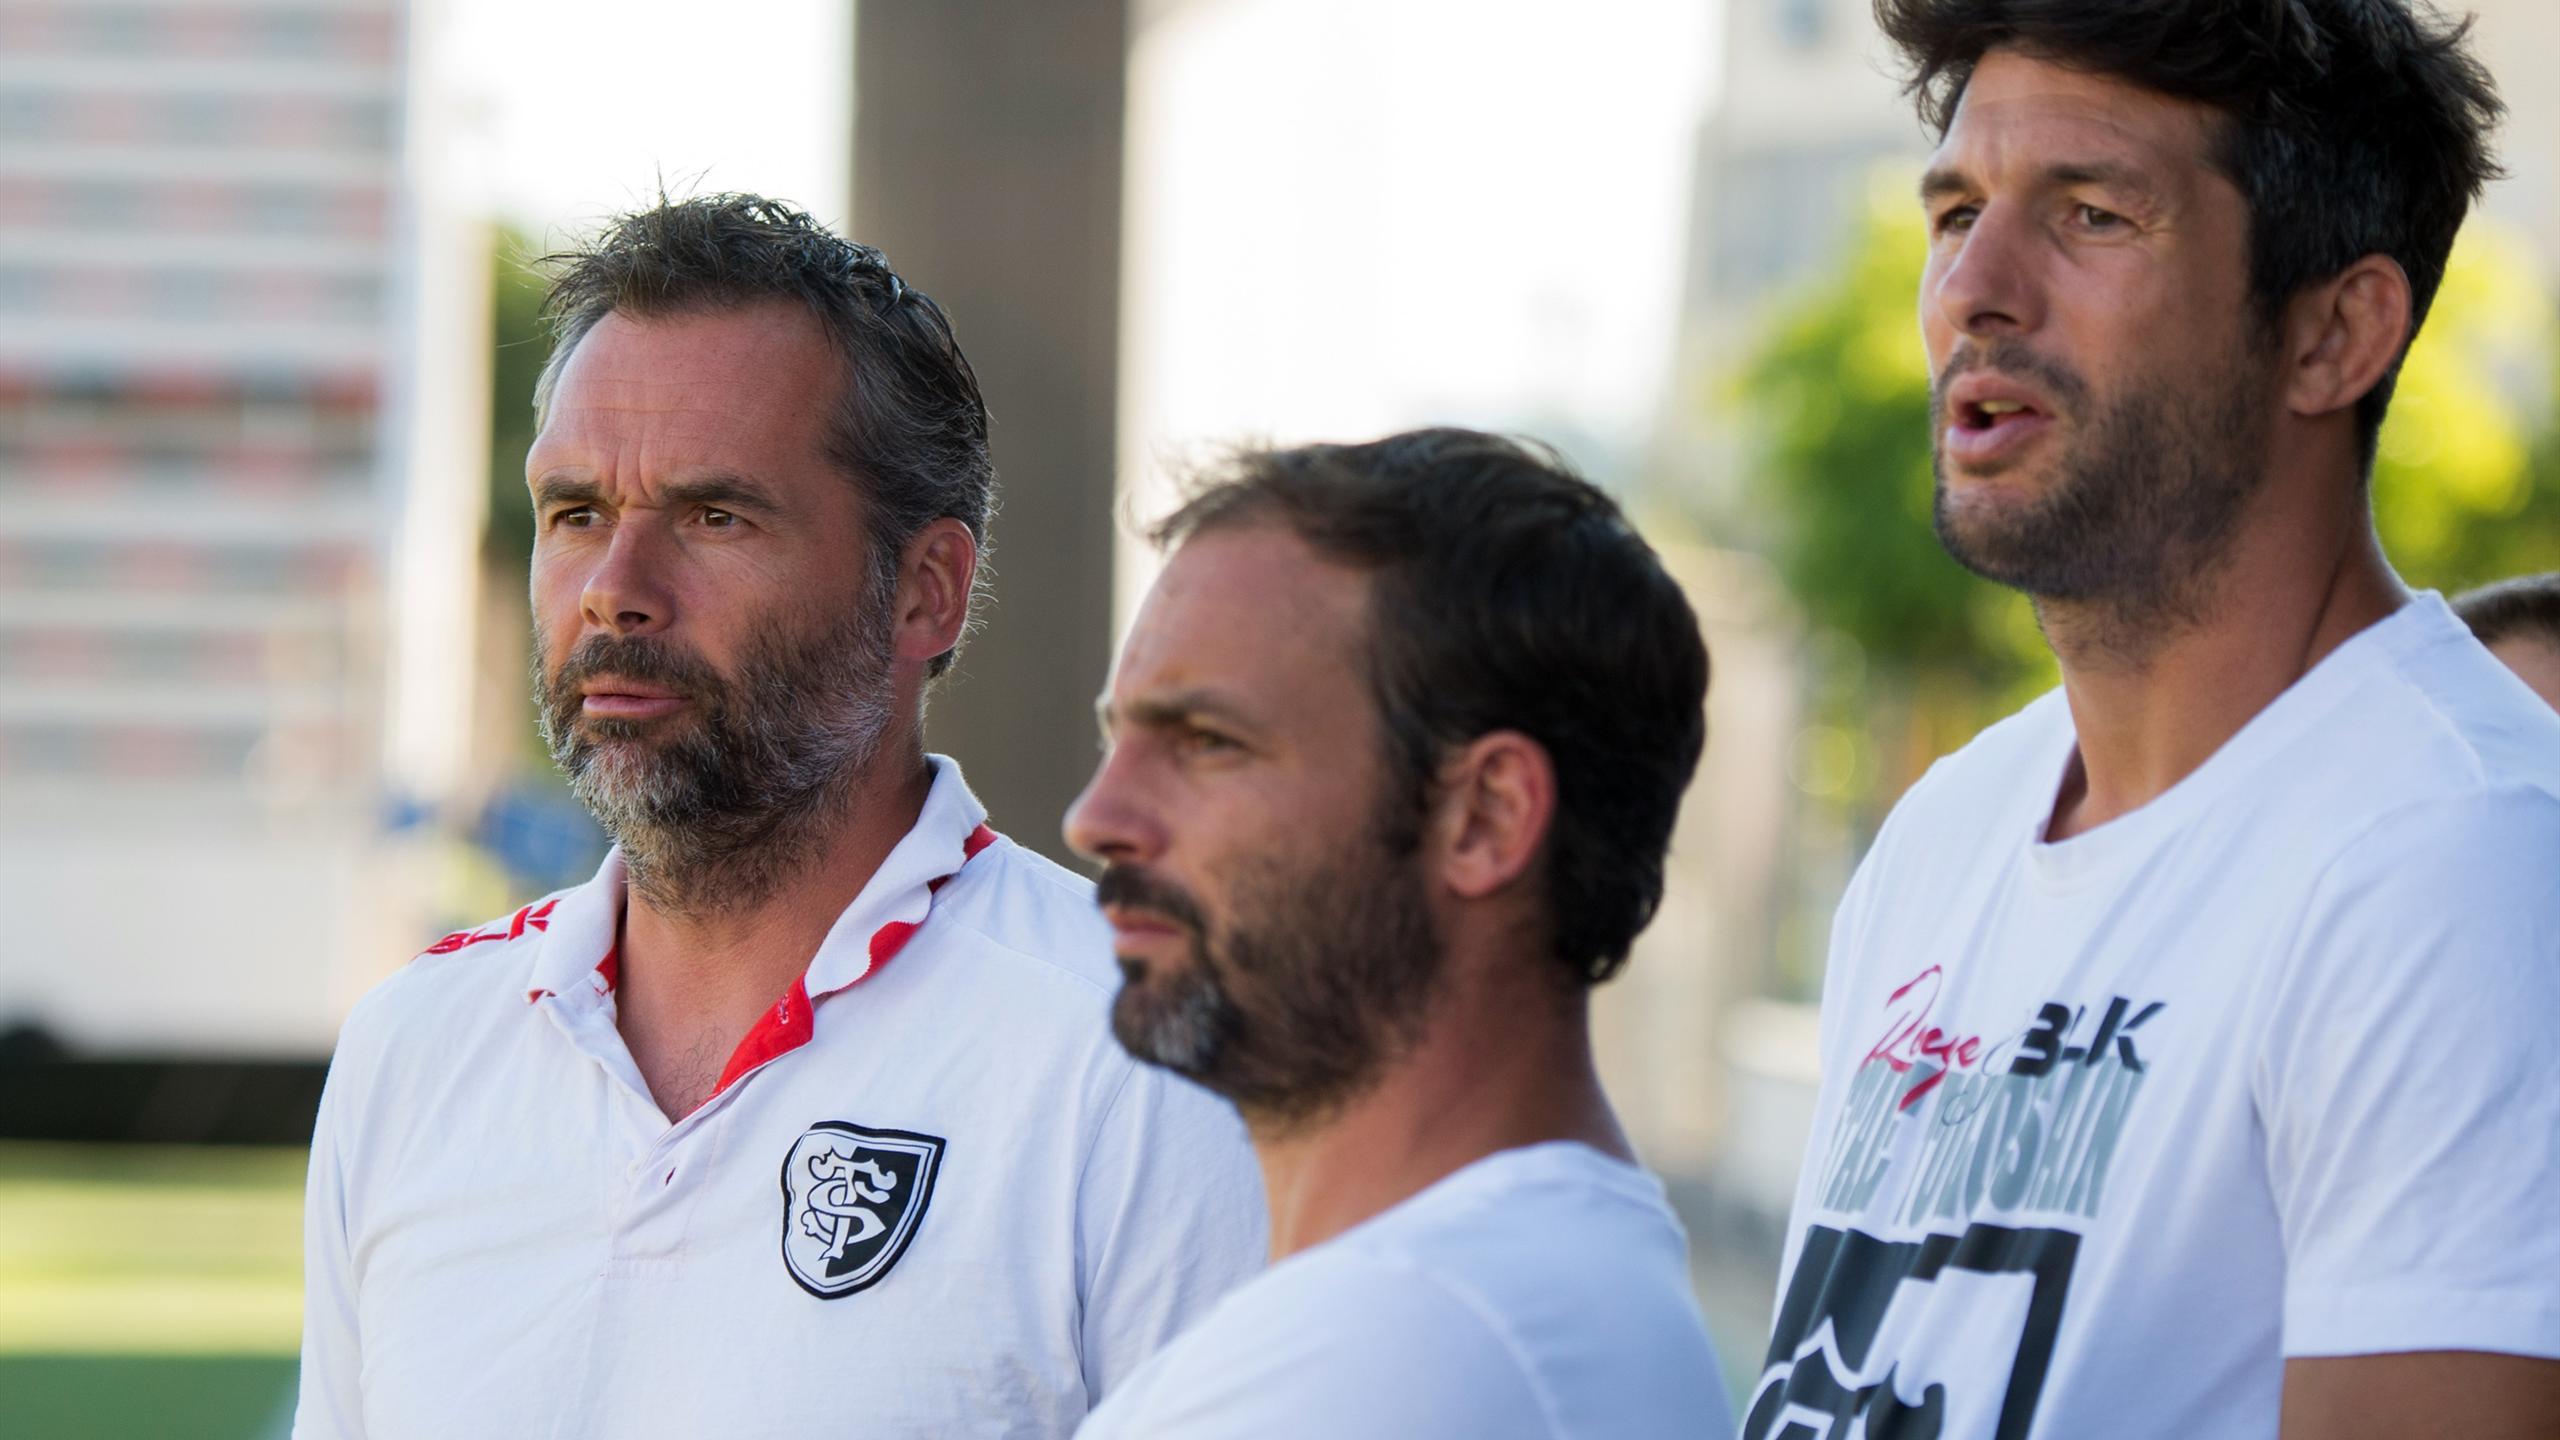 Ugo Mola, Jean-Baptiste Elissalde et Jean Bouilhou (Toulouse) - 12 août 2016